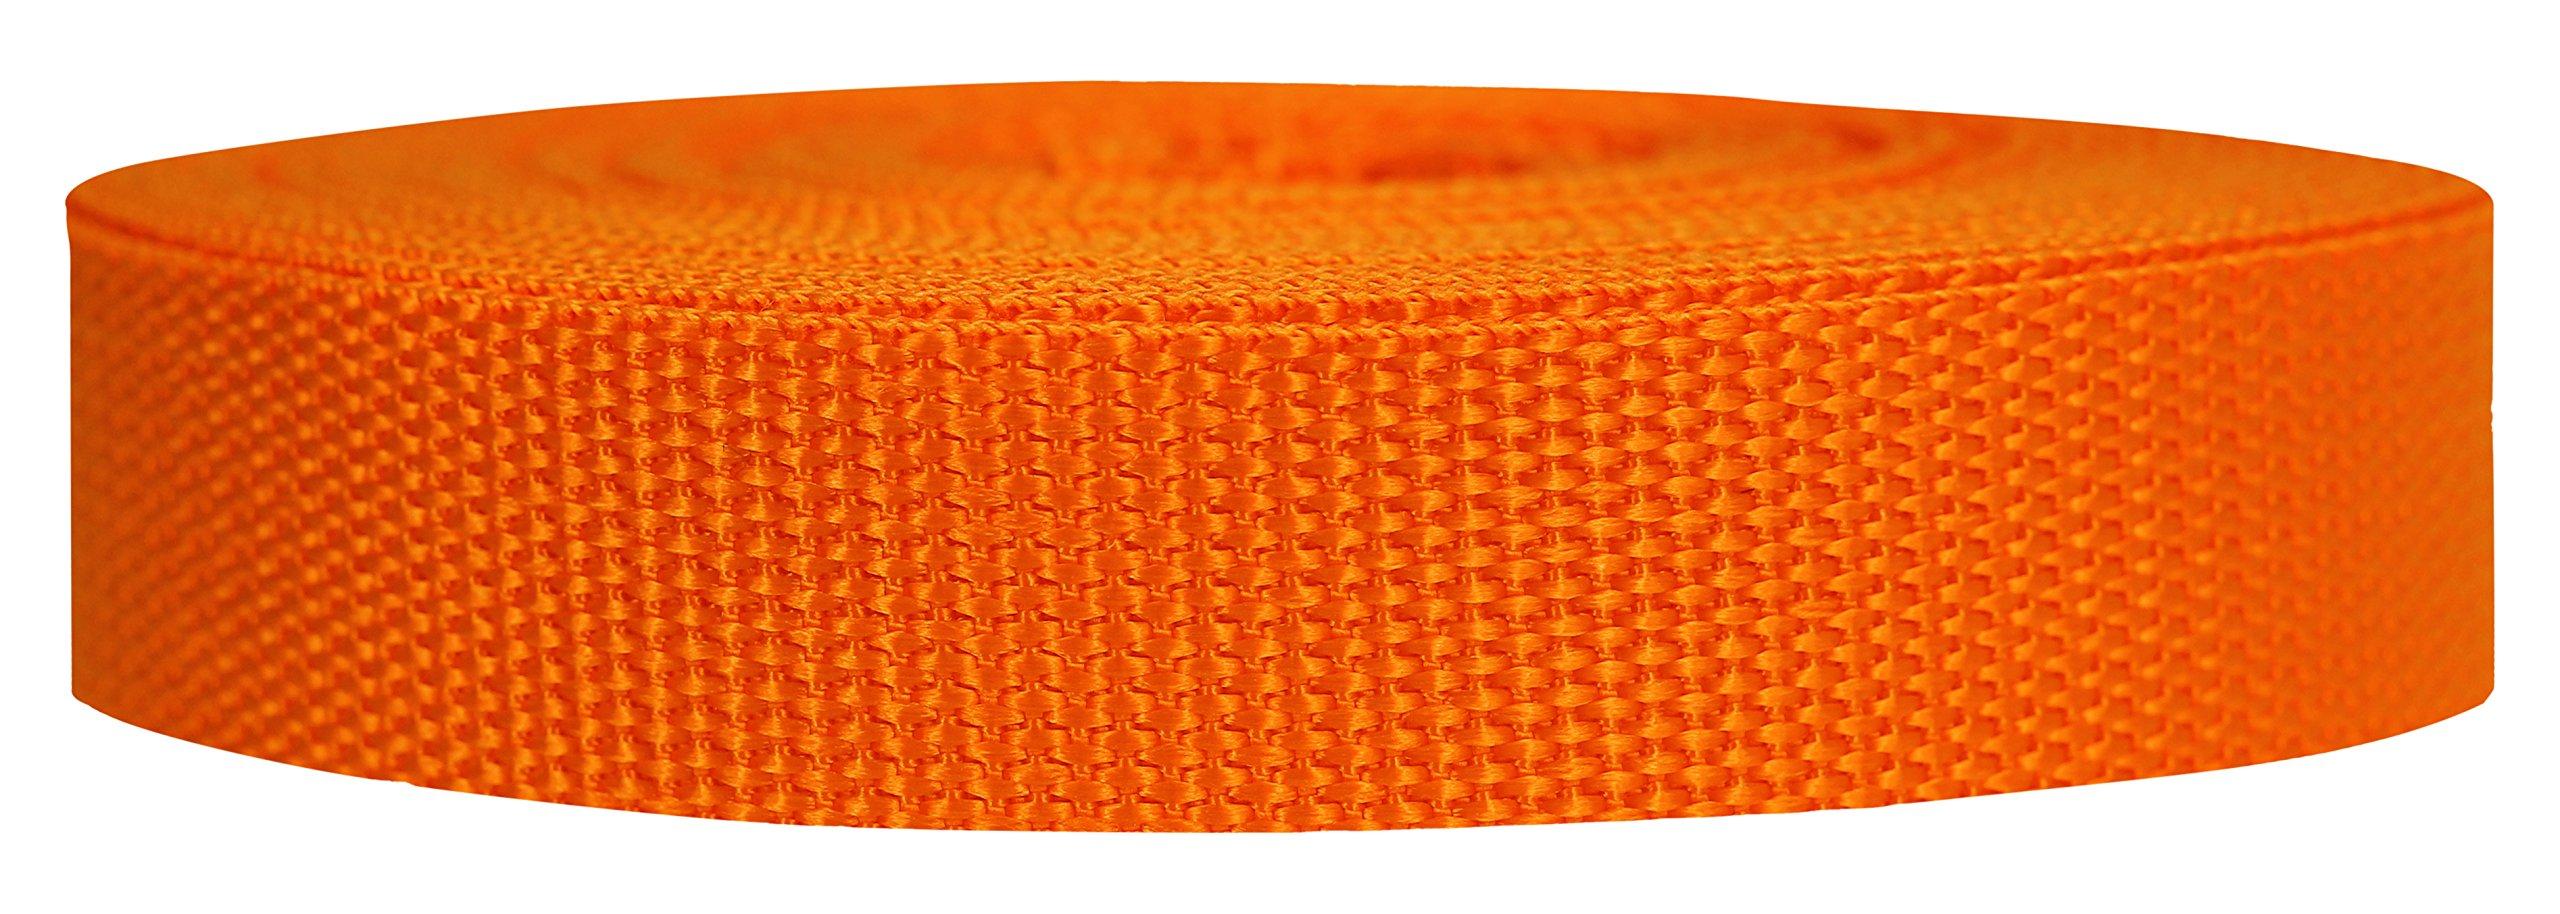 Strapworks Heavyweight Polypropylene Webbing - Heavy Duty Poly Strapping for Outdoor DIY Gear Repair, 1 Inch x 10 Yards - Orange